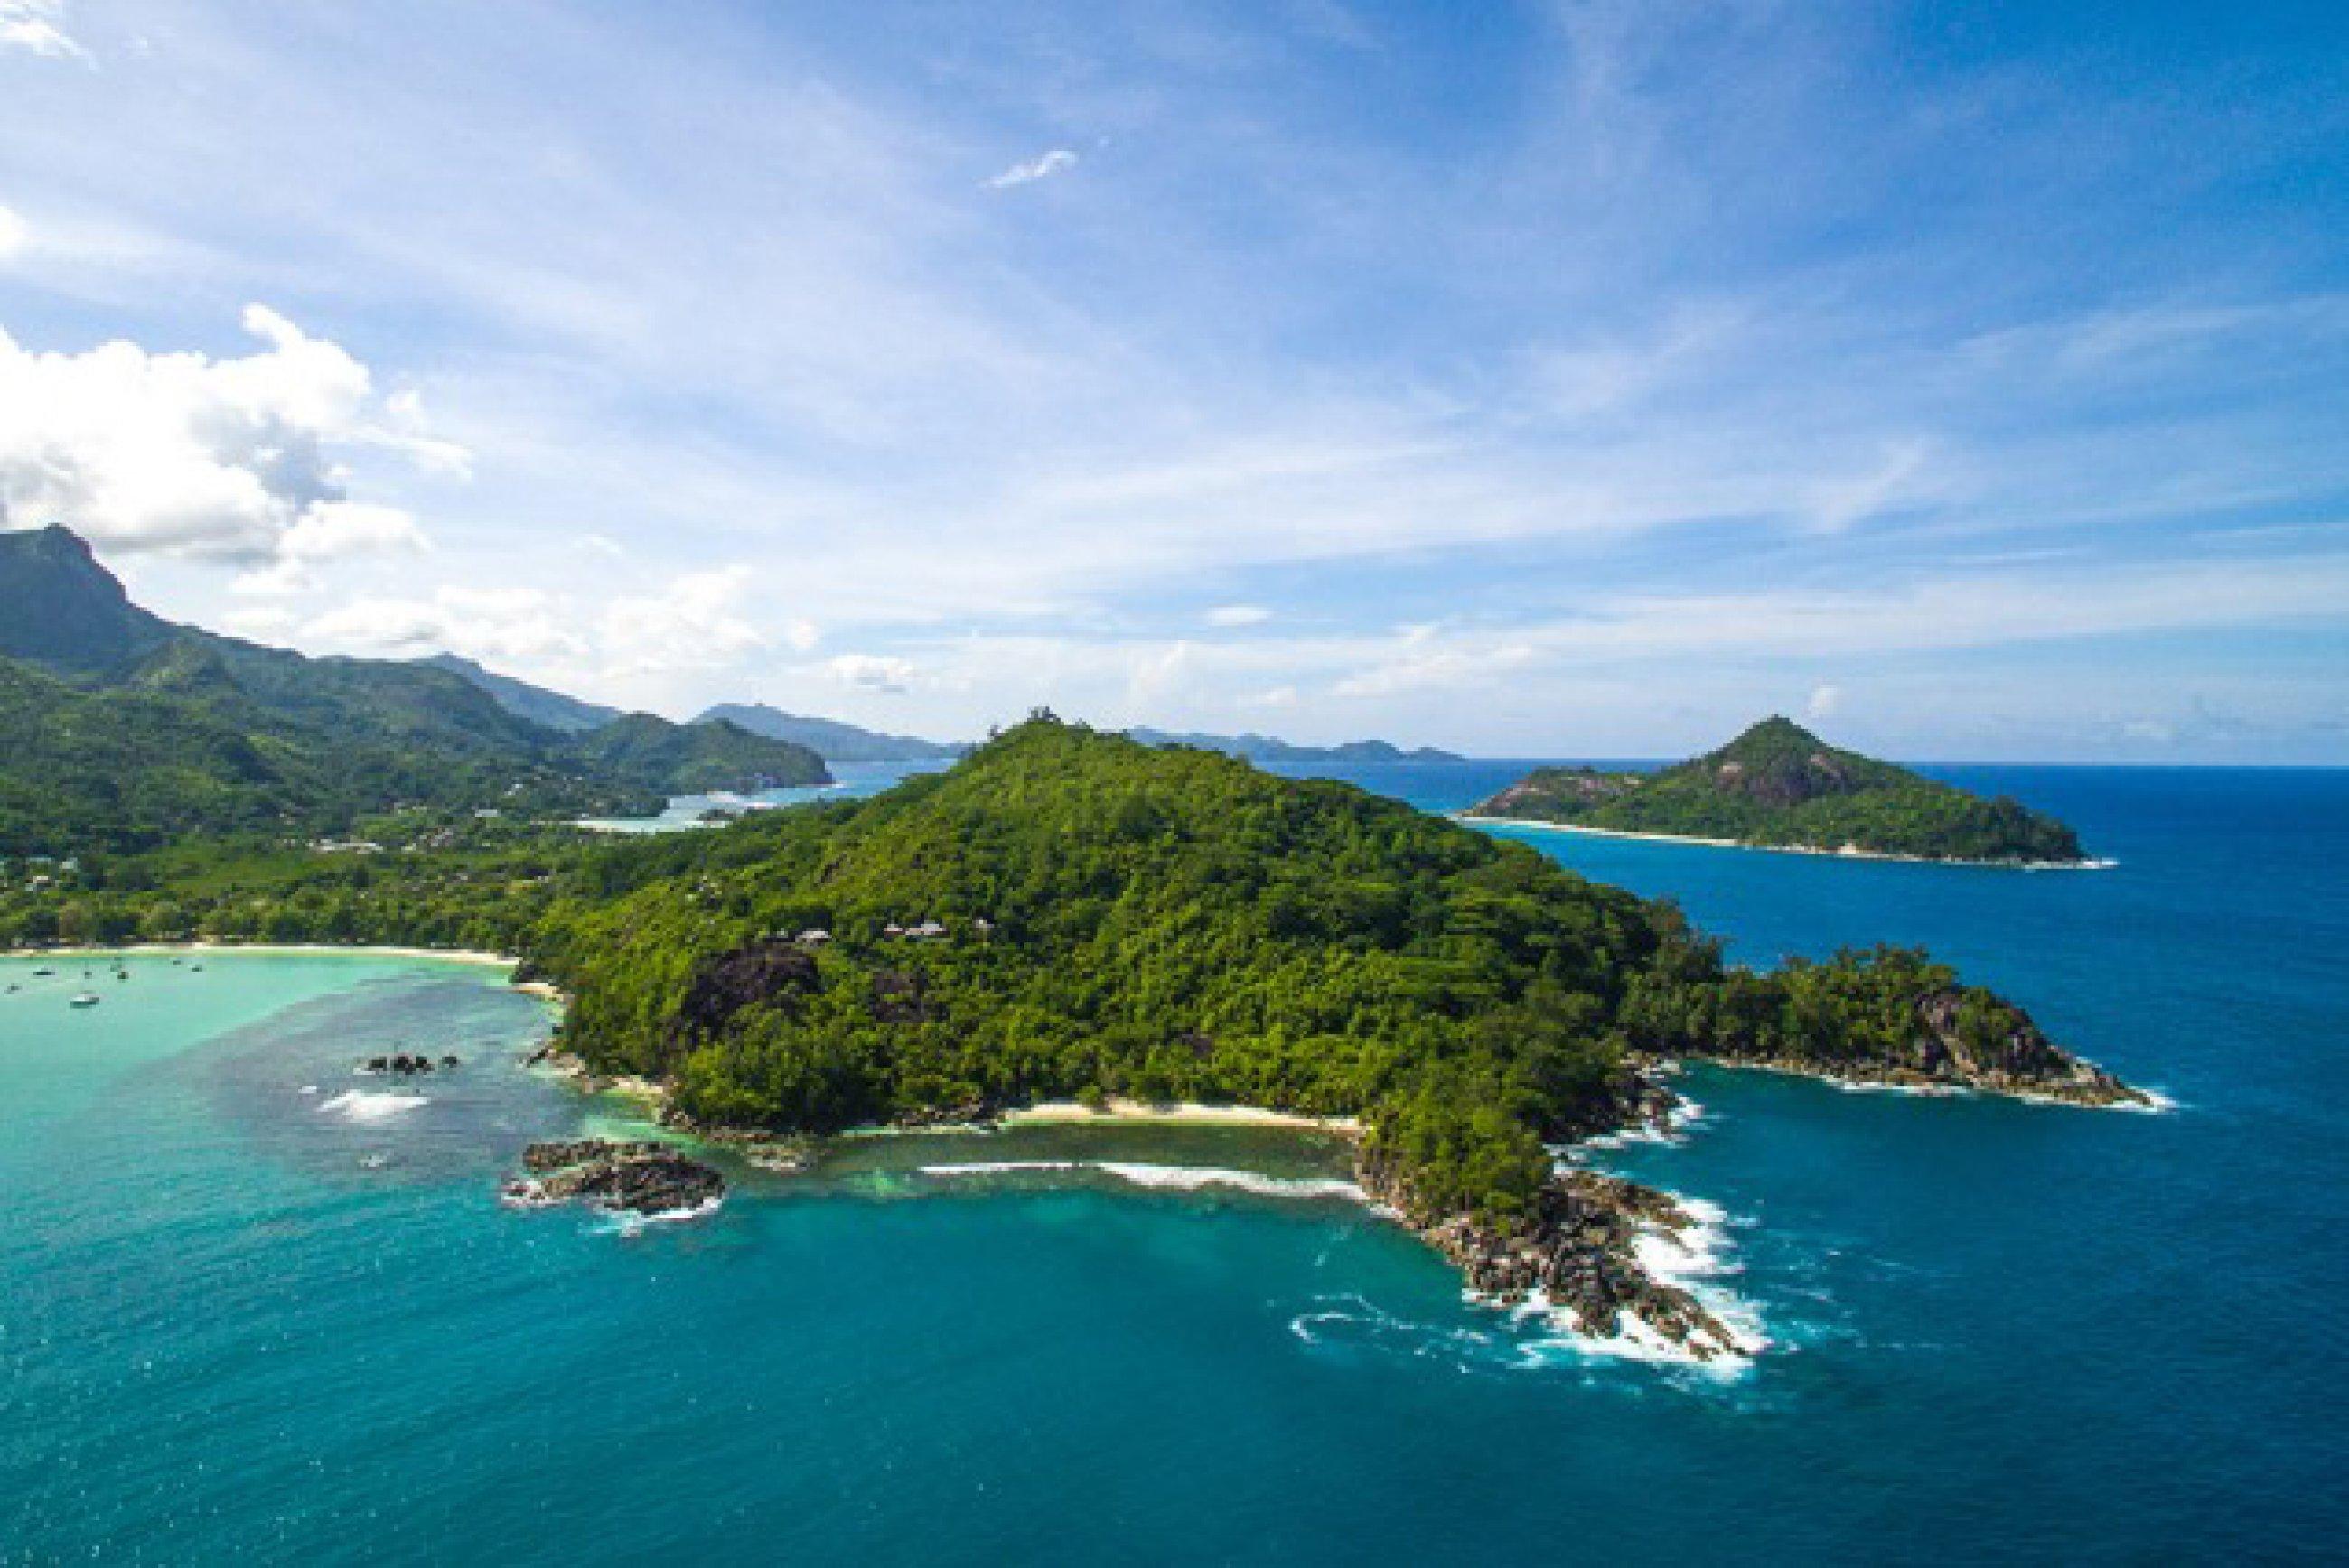 https://bubo.sk/uploads/galleries/16287/ephelia-seychelles-2016-aerial-view-02.jpg